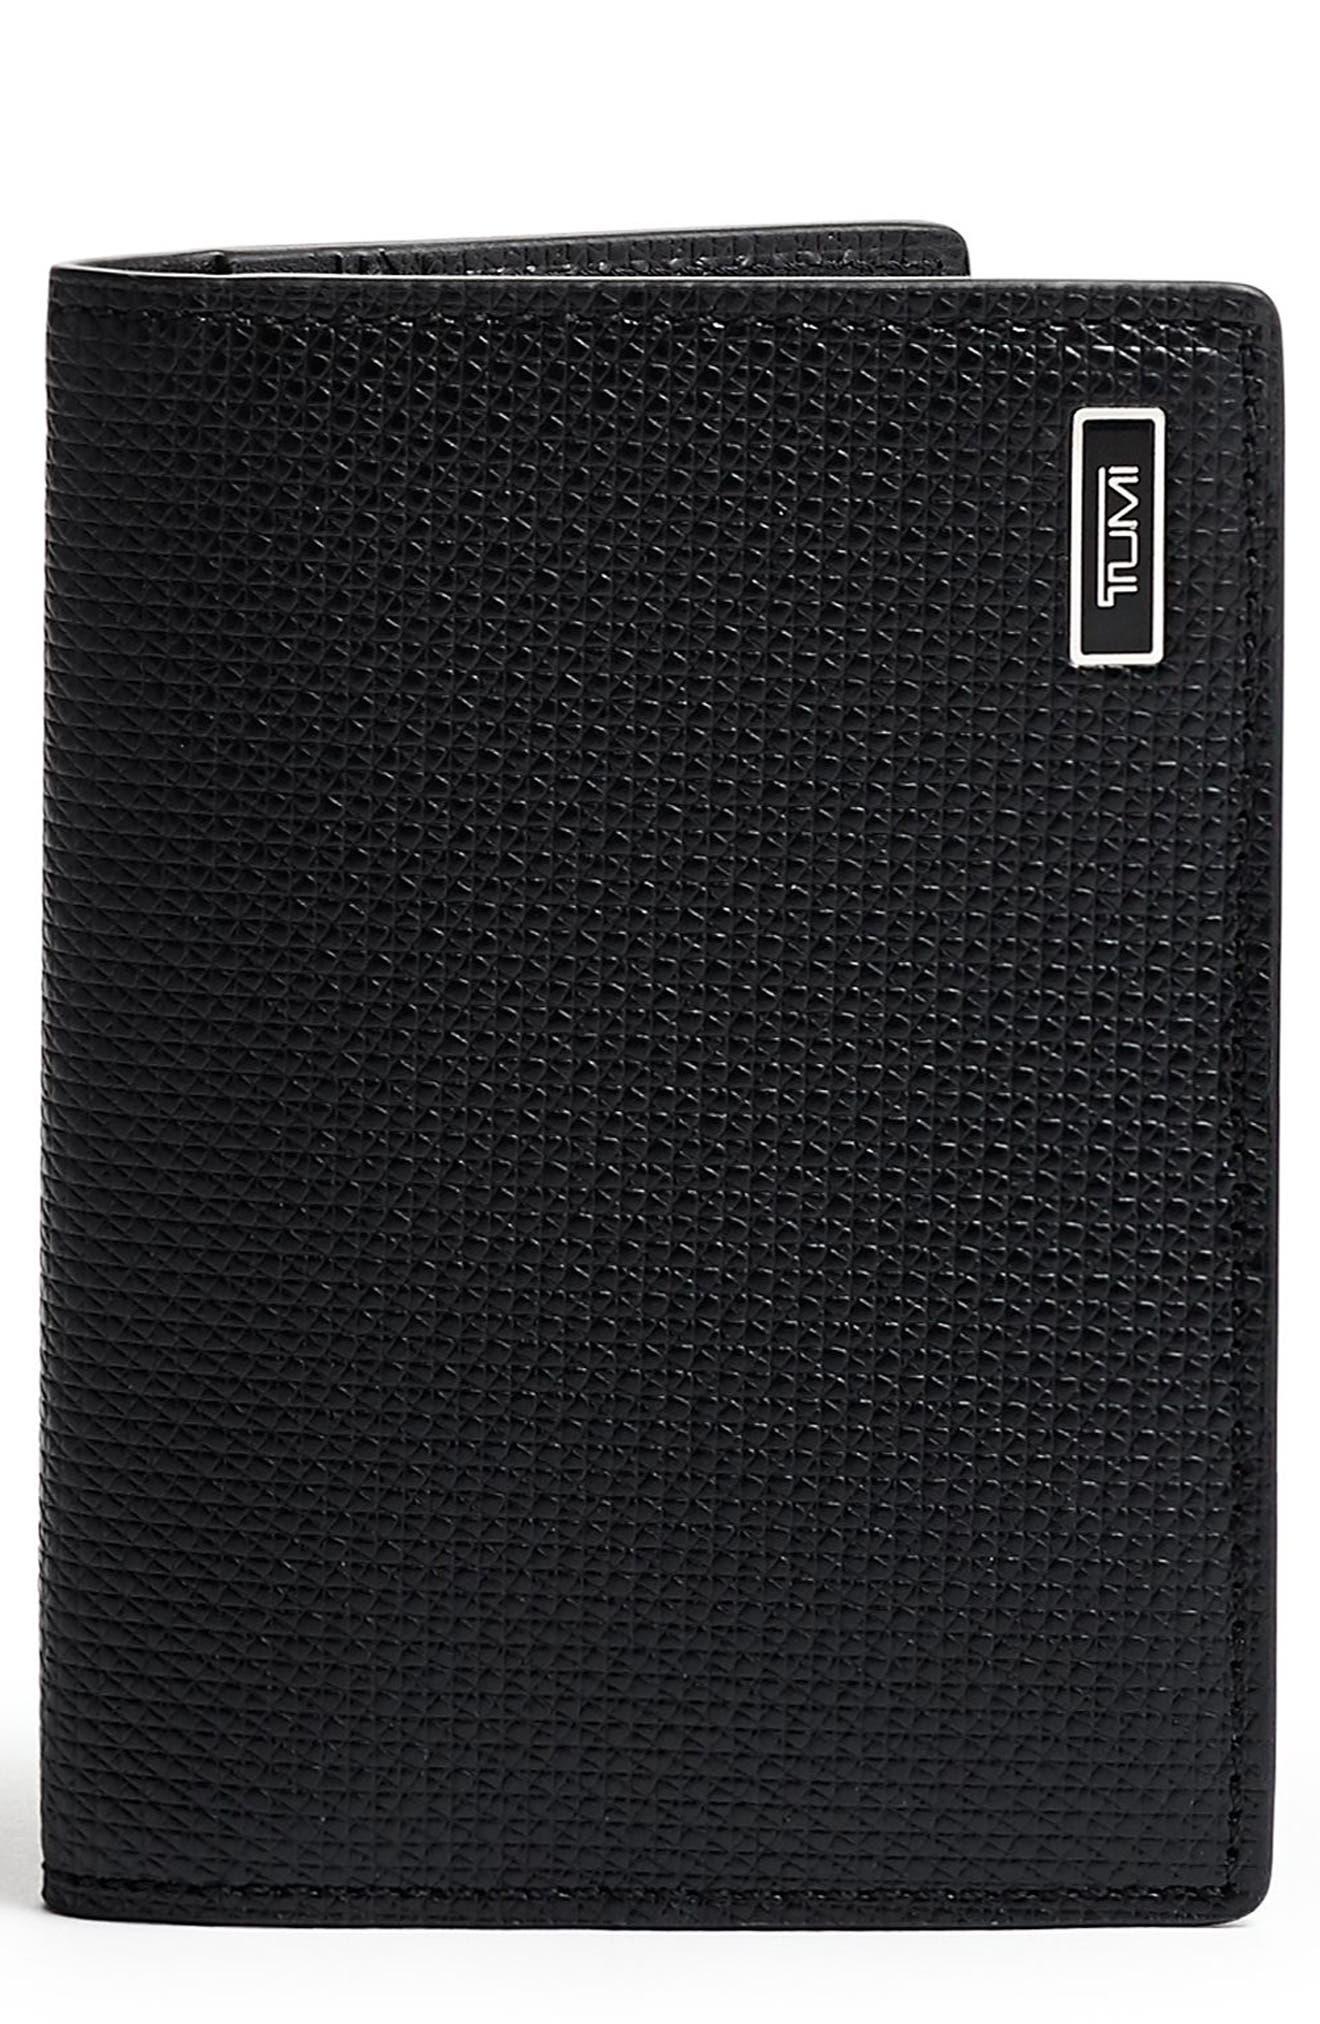 Monaco Folding Leather Card Case,                             Main thumbnail 1, color,                             BLACK